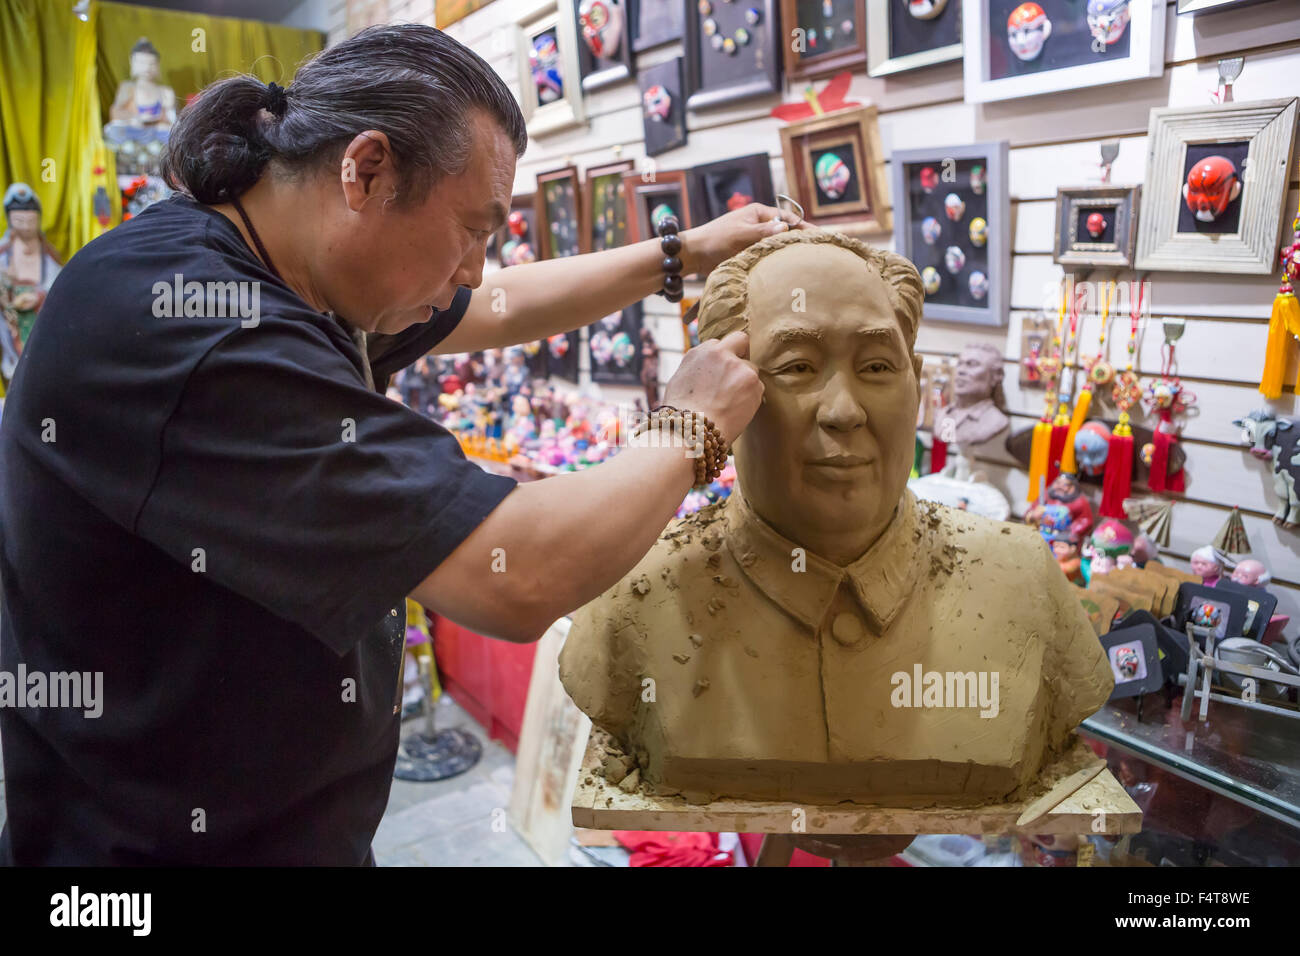 China, Beijing, Peking, City, Qianmen Area, Sculptor - Stock Image